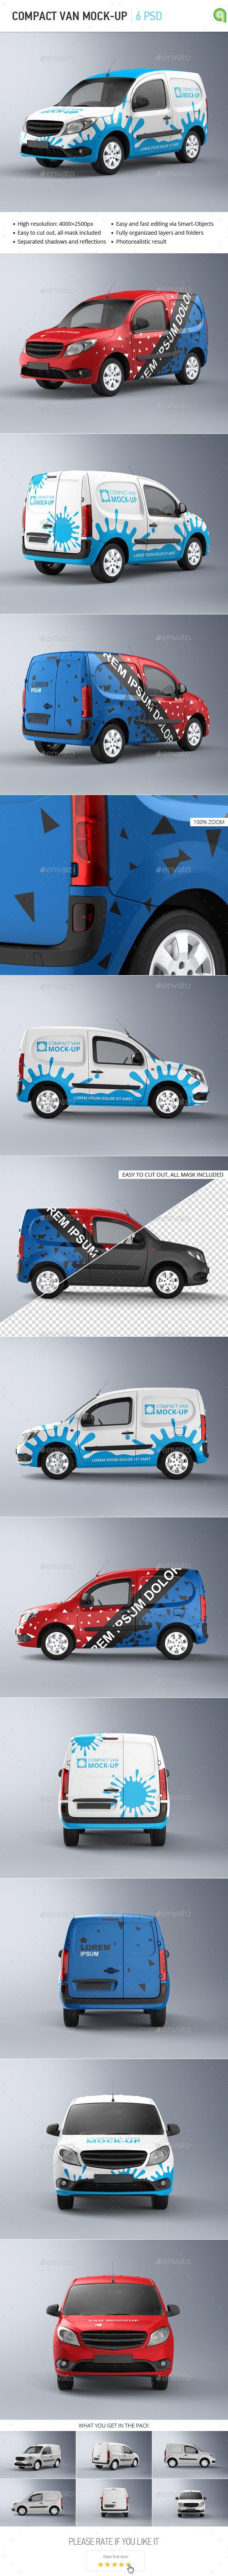 Car sticker design psd - Car Sticker Design Psd 27